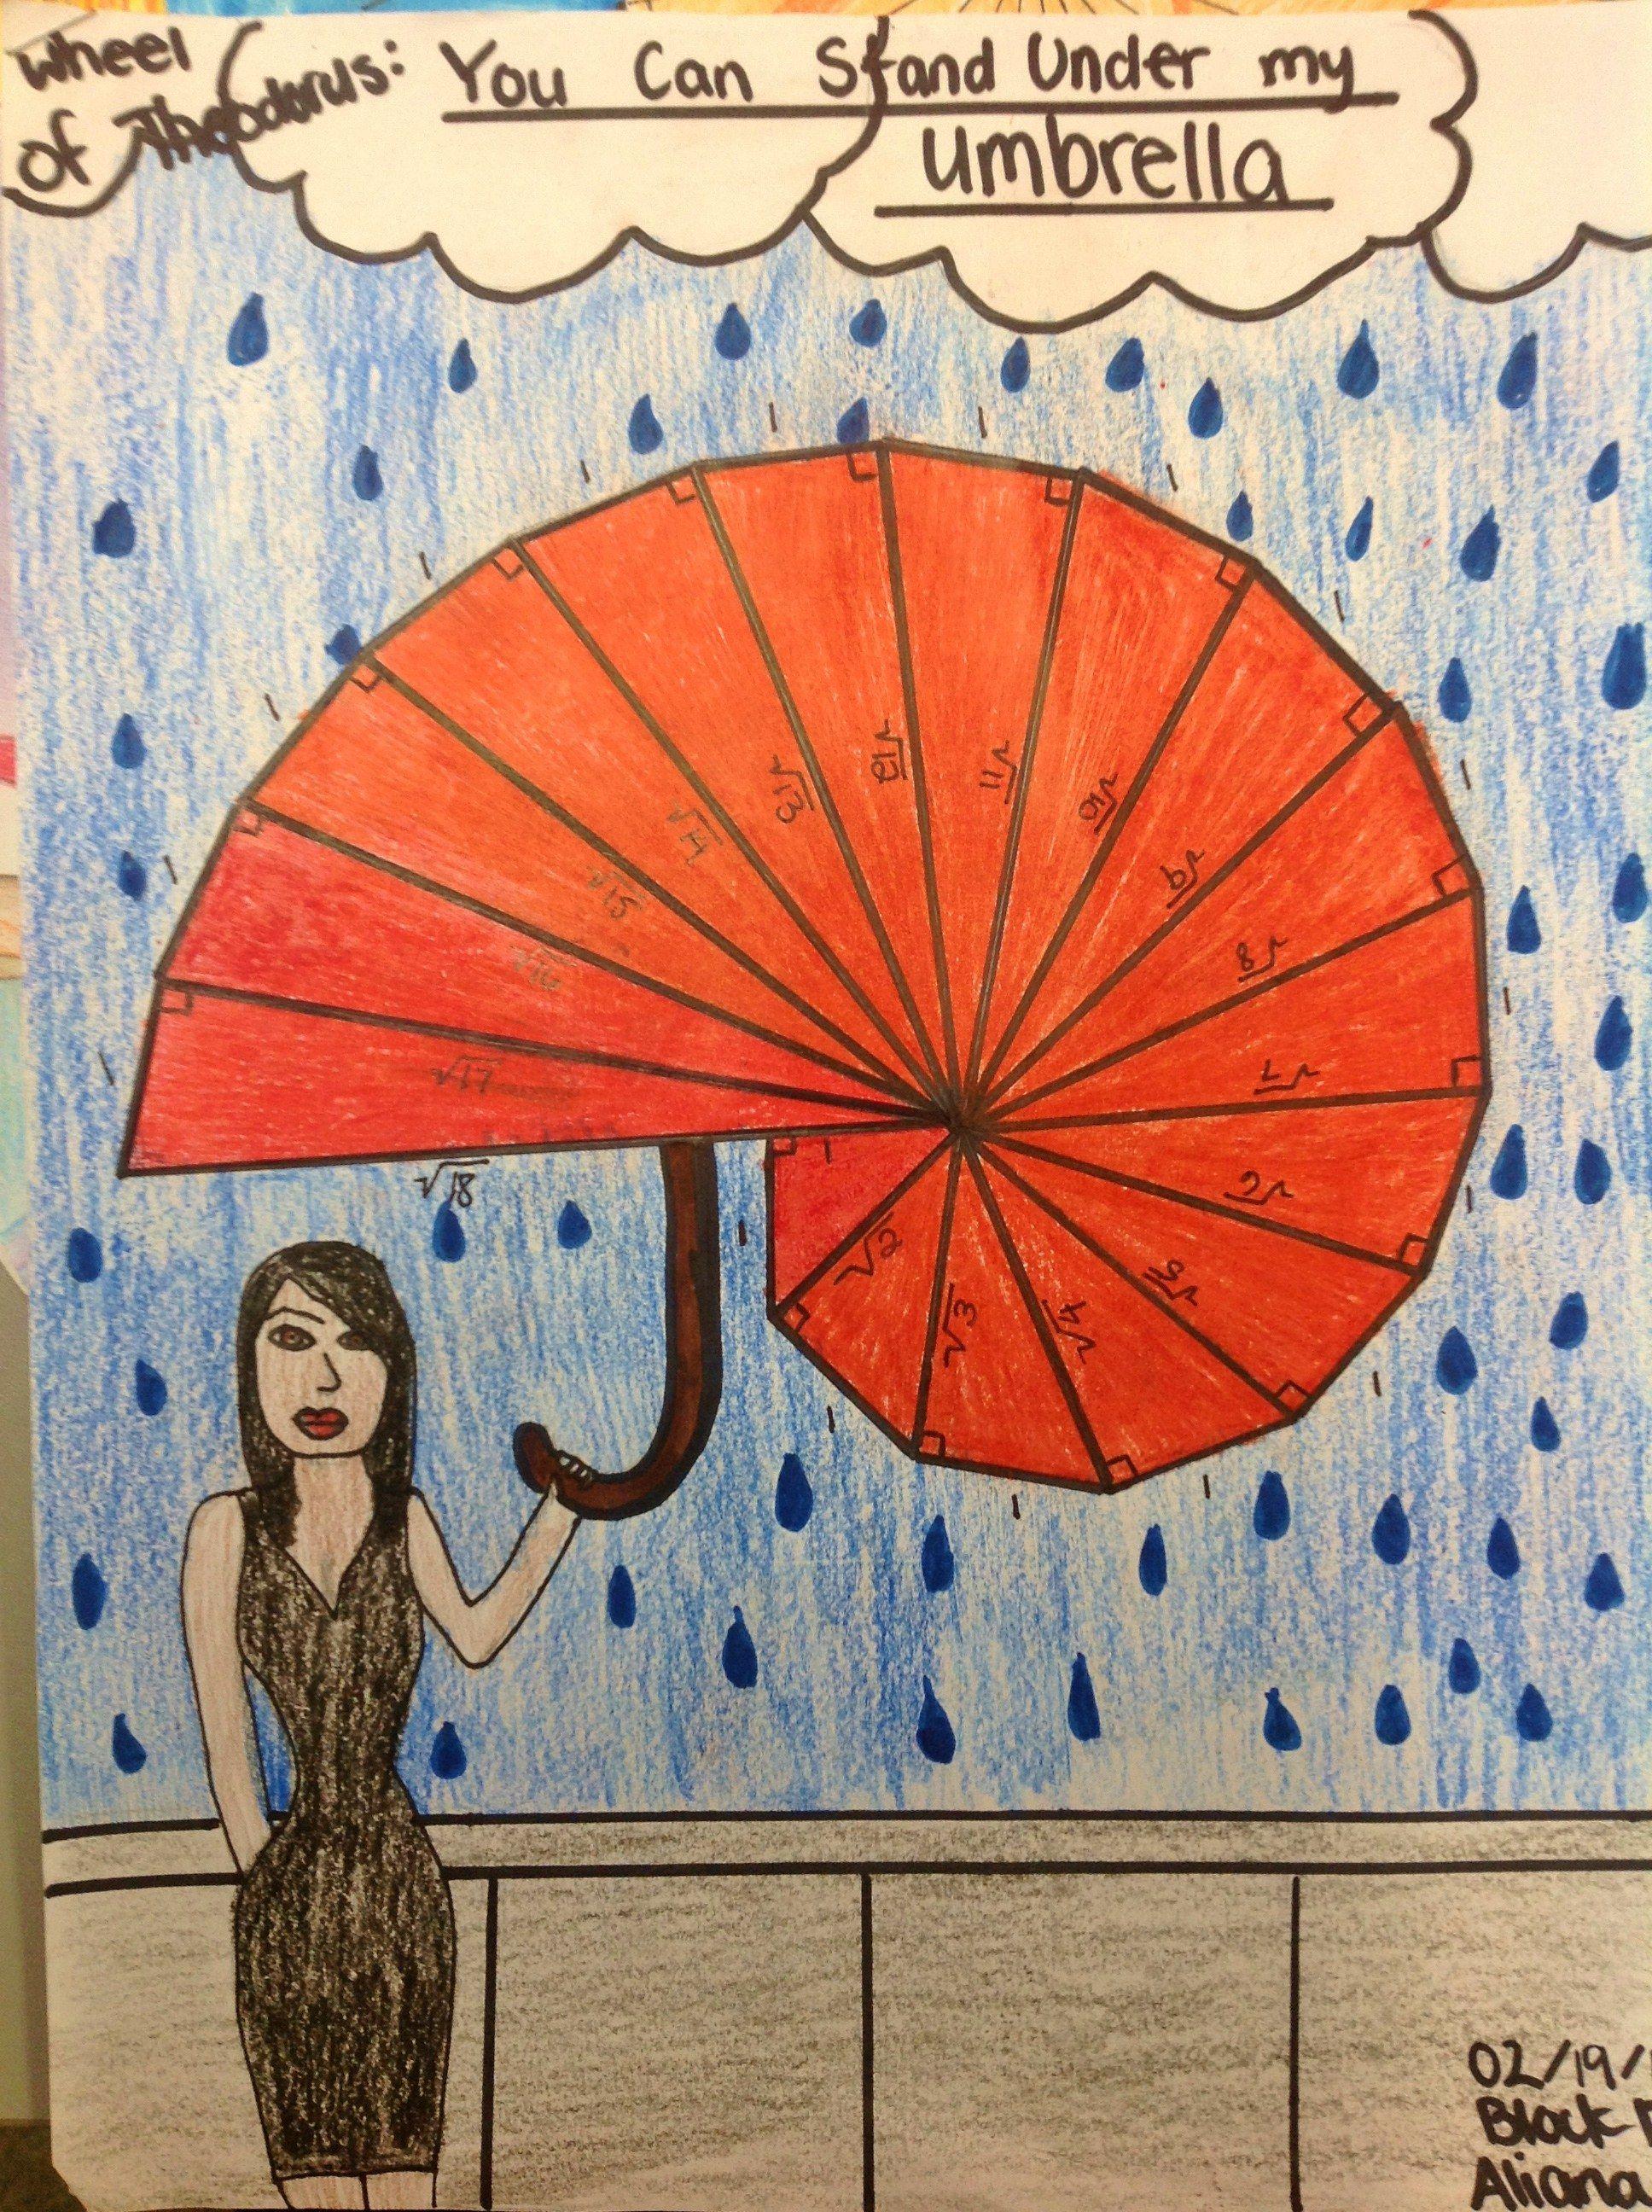 Umbrella Goruntuler Ile